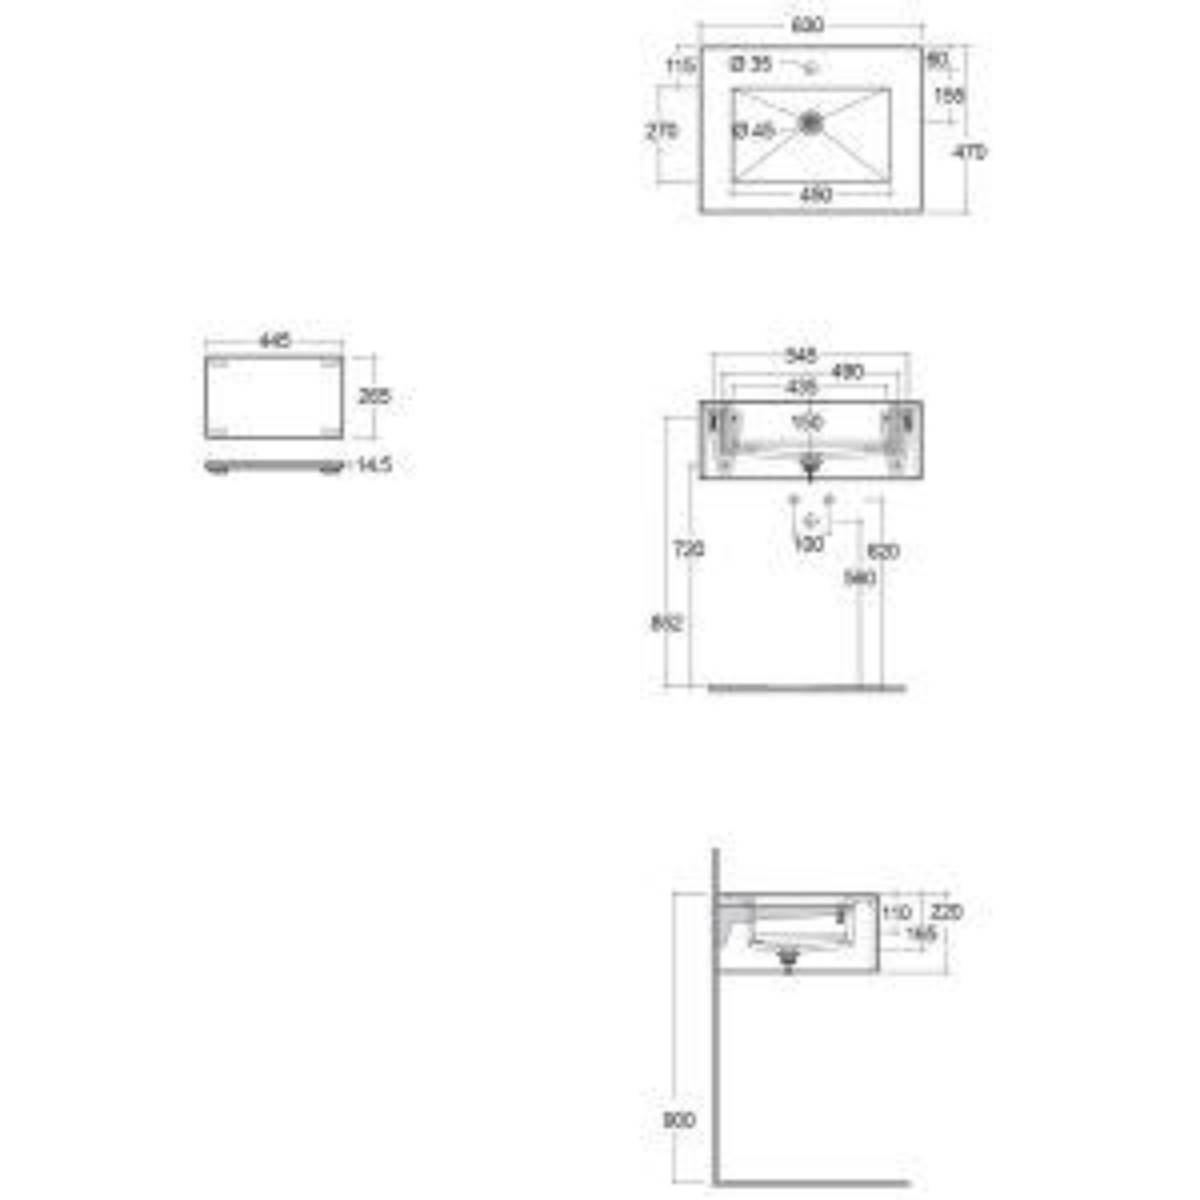 RAK Precious Behind Grey Wall Hung Counter Basin with Brackets Measurements